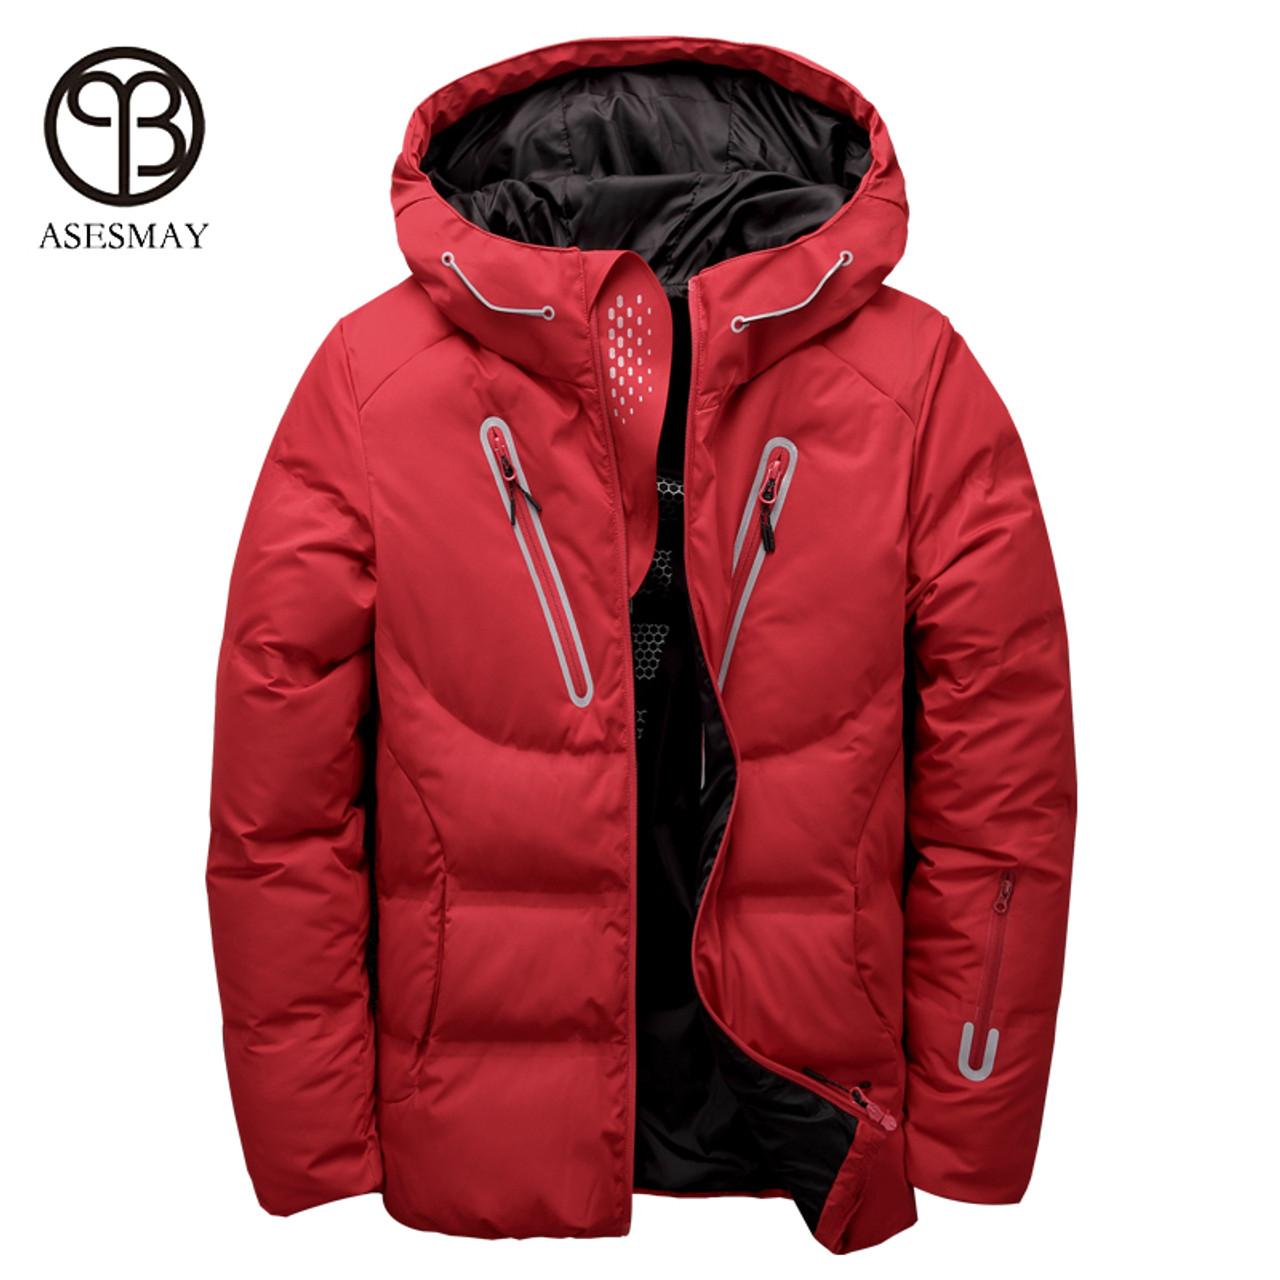 efd61e610 Asesmay luxury men winter jacket white duck down parka casual goose feather  men's winter coat hood thick warm waterproof jackets